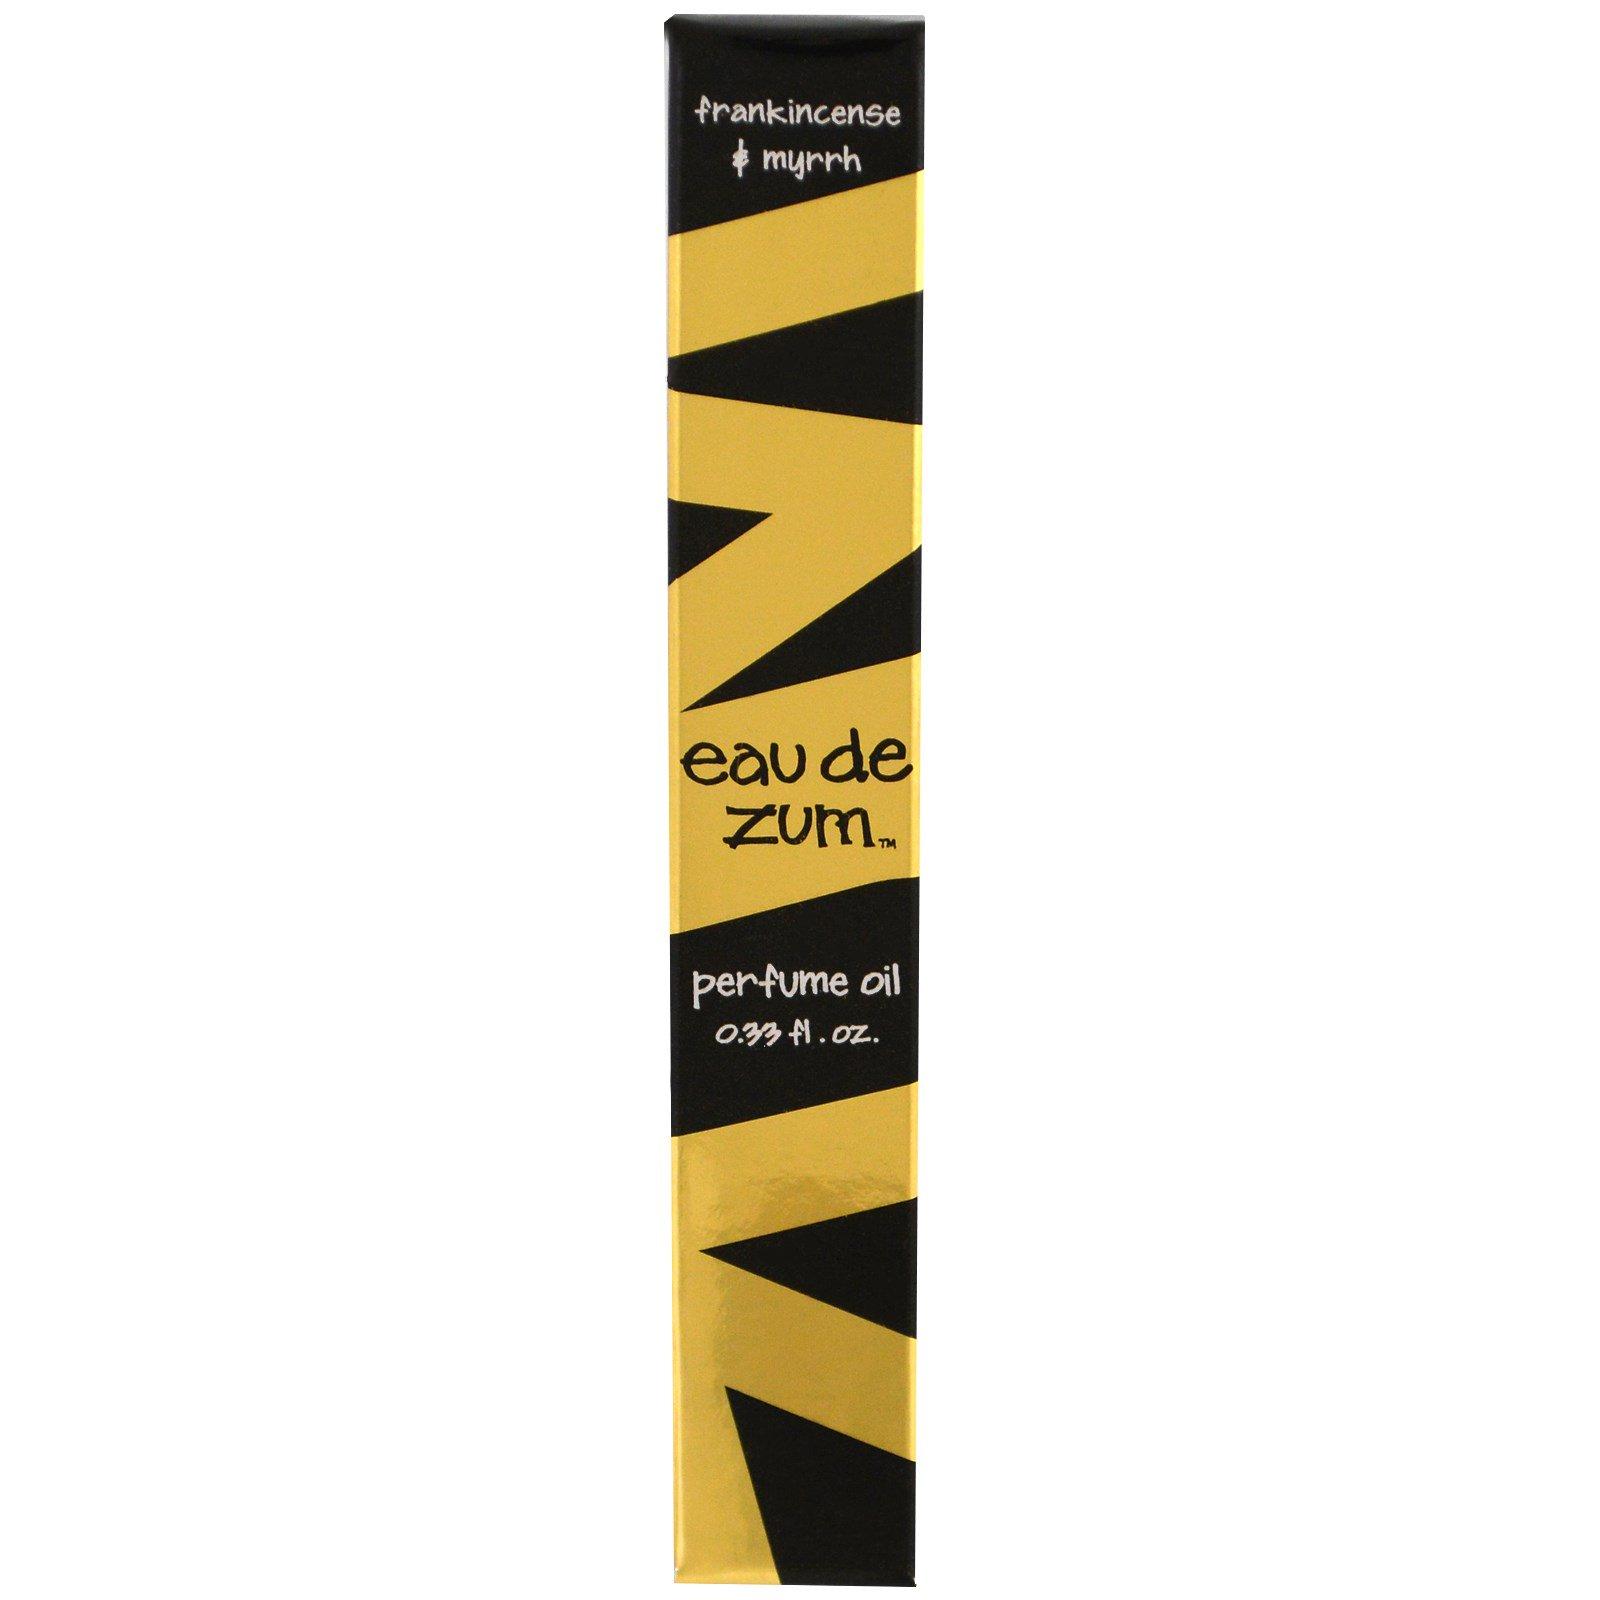 Indigo Wild, Eau De Zum, парфюмерное масло, ладан и мирра, 0,33 жидкие унции